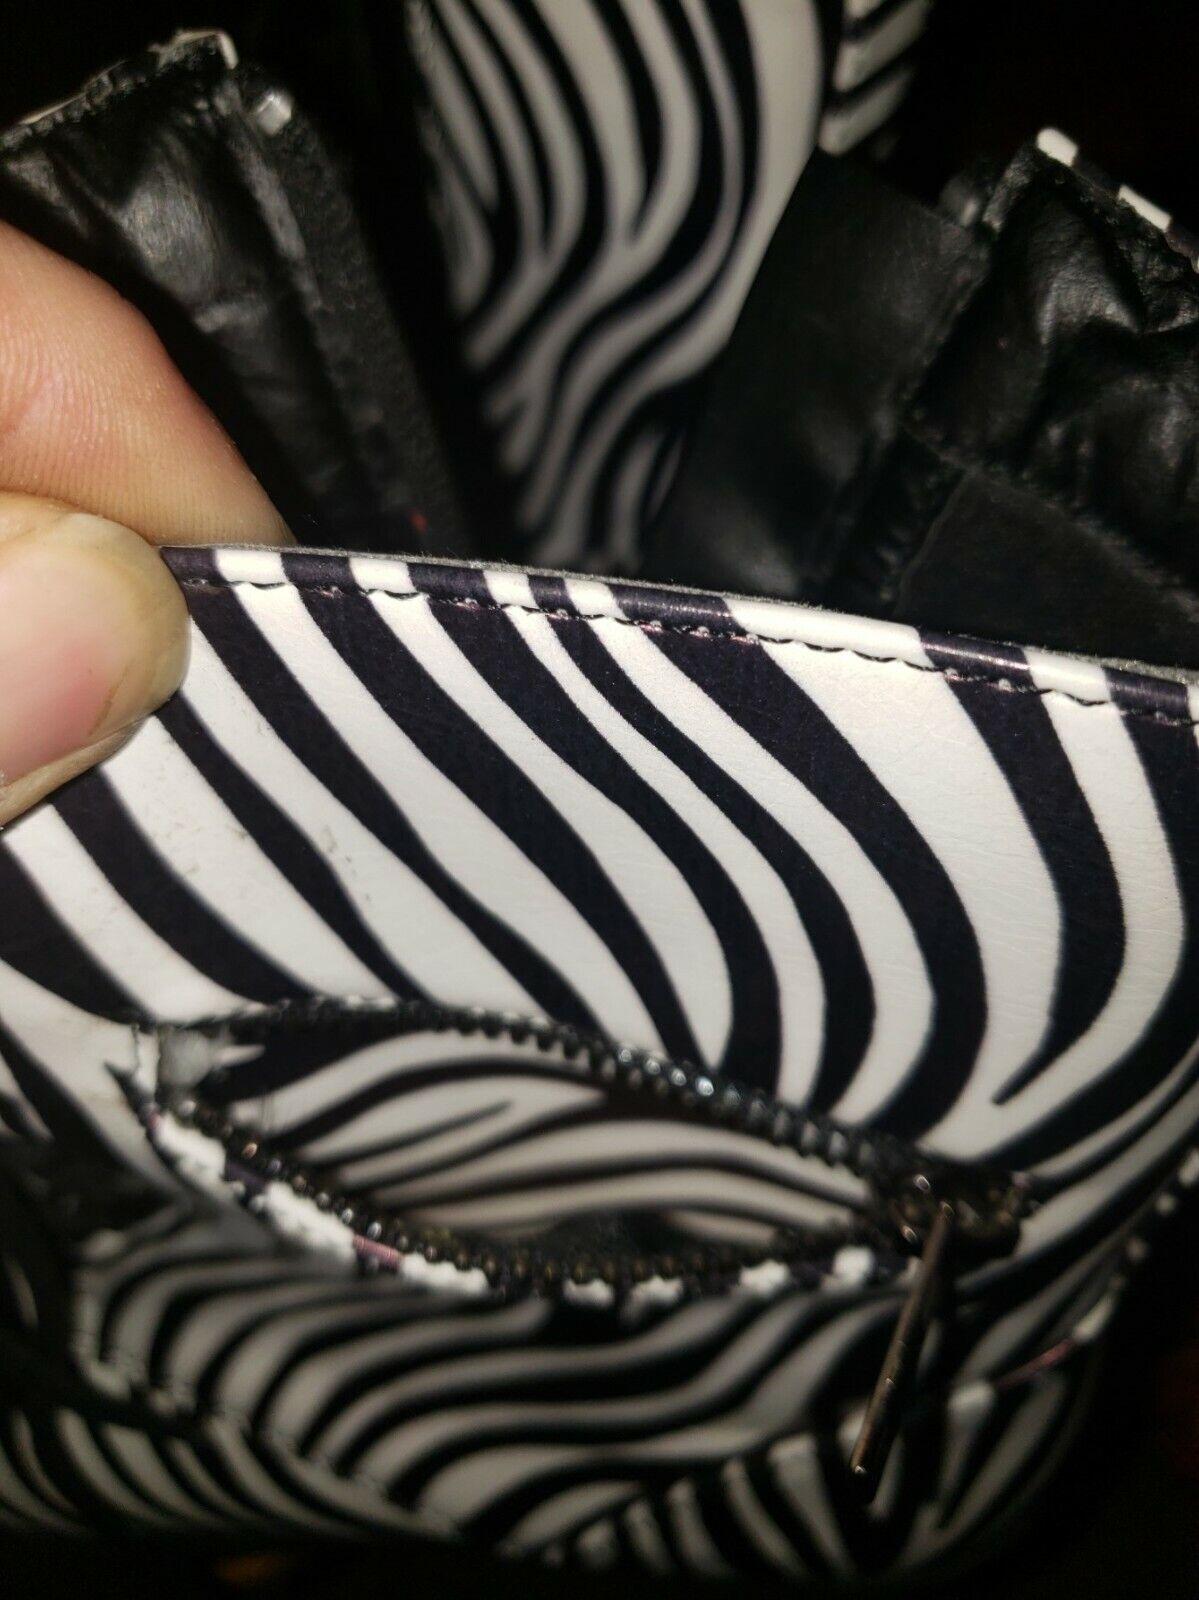 cinak mid calf zebra print womens size 7 boots - image 3